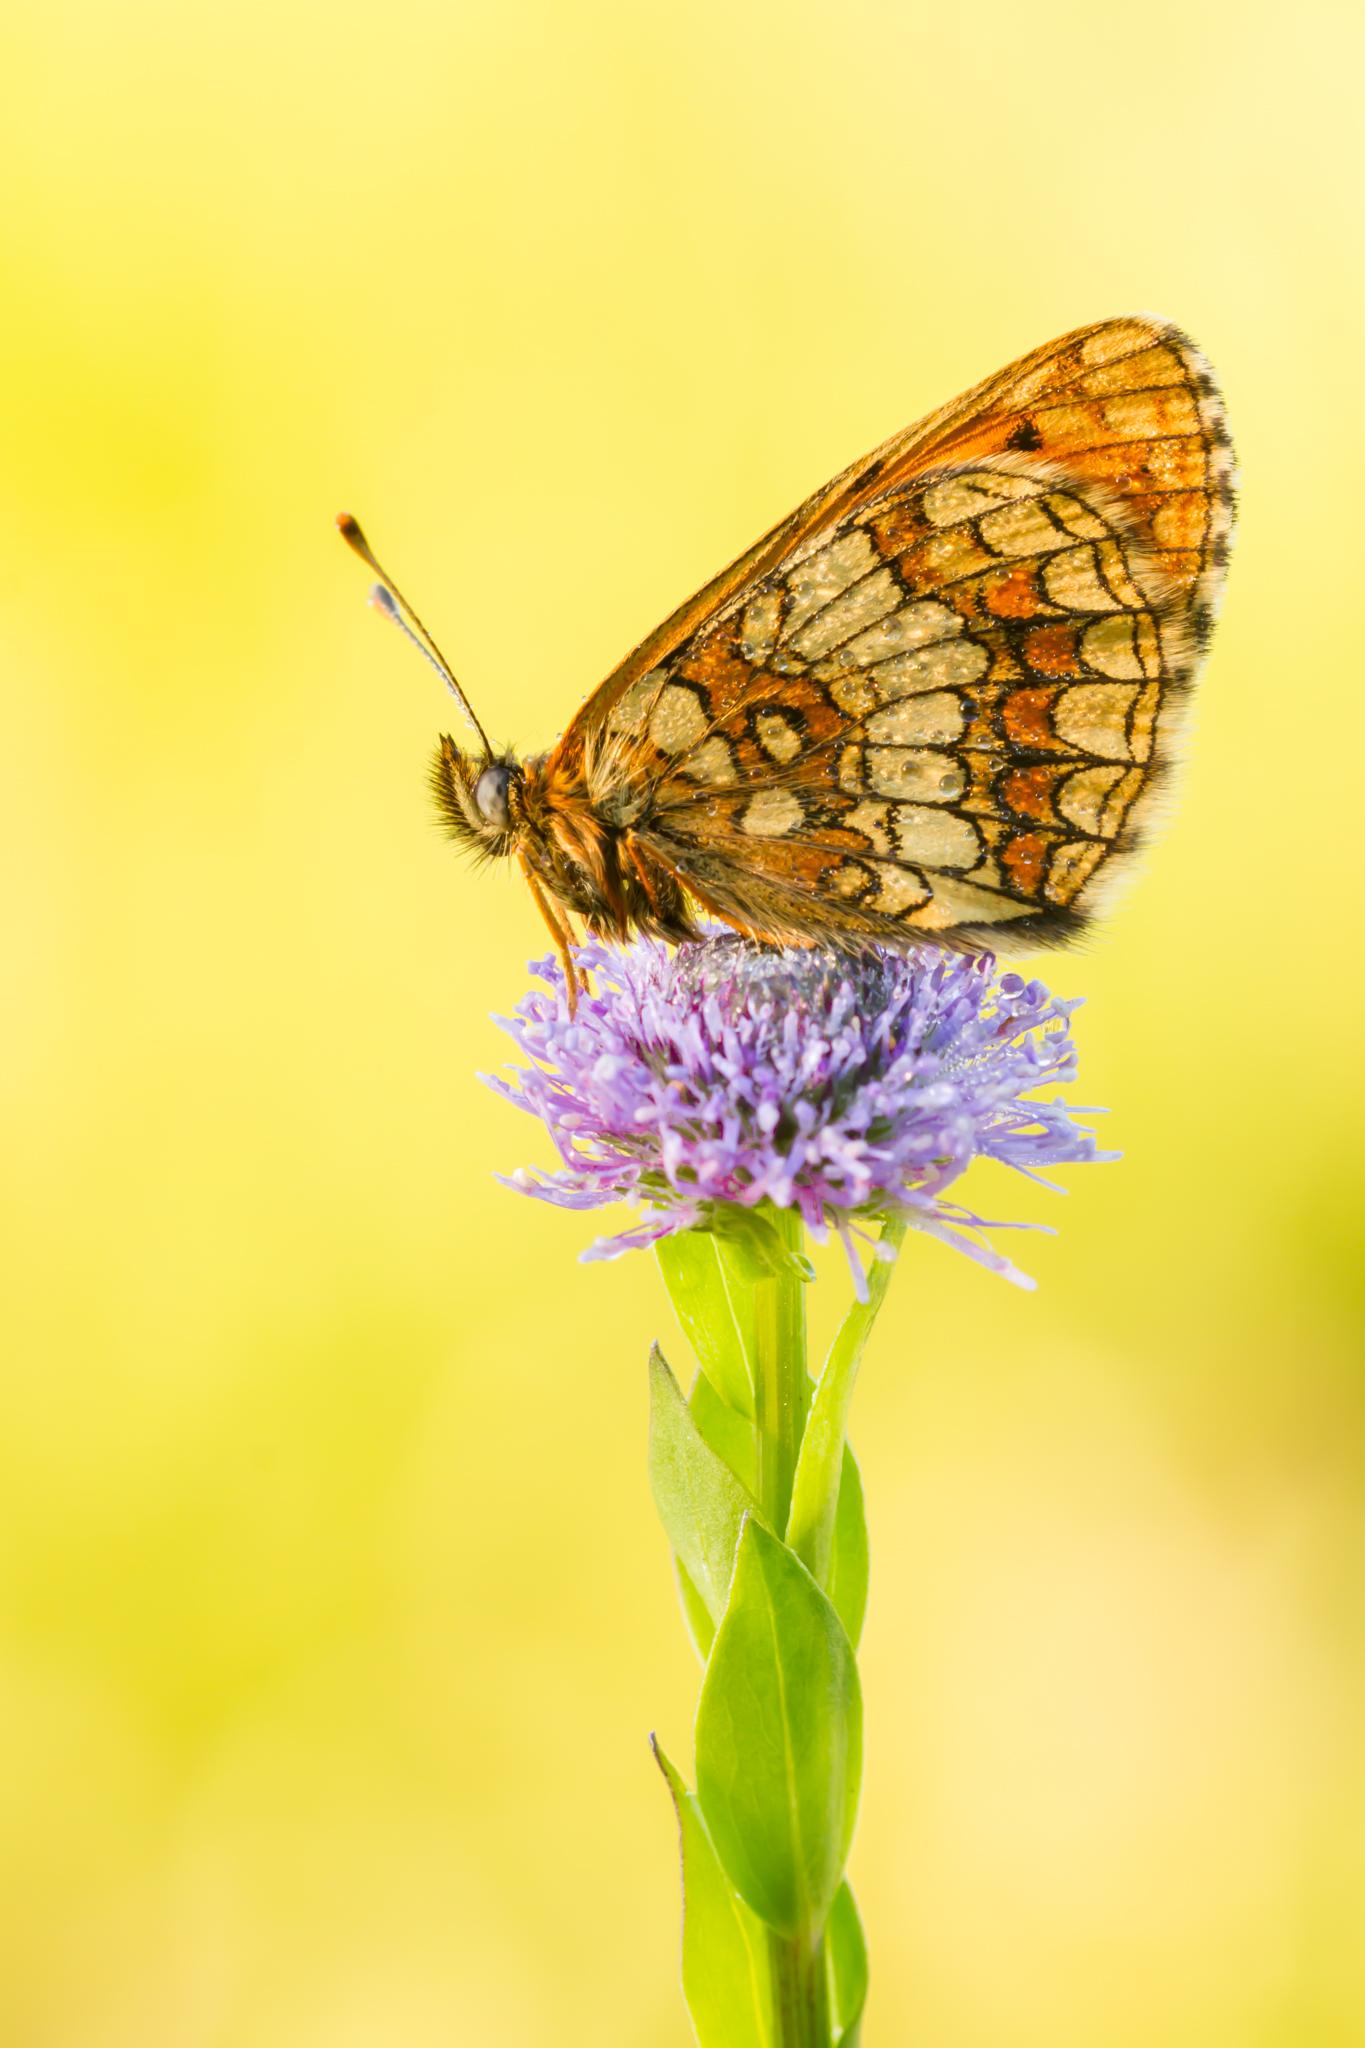 Bosparelmoervlinder, Viroinval, Vlinders in de Viroinval, Nismes, Vlinder, Vlinders